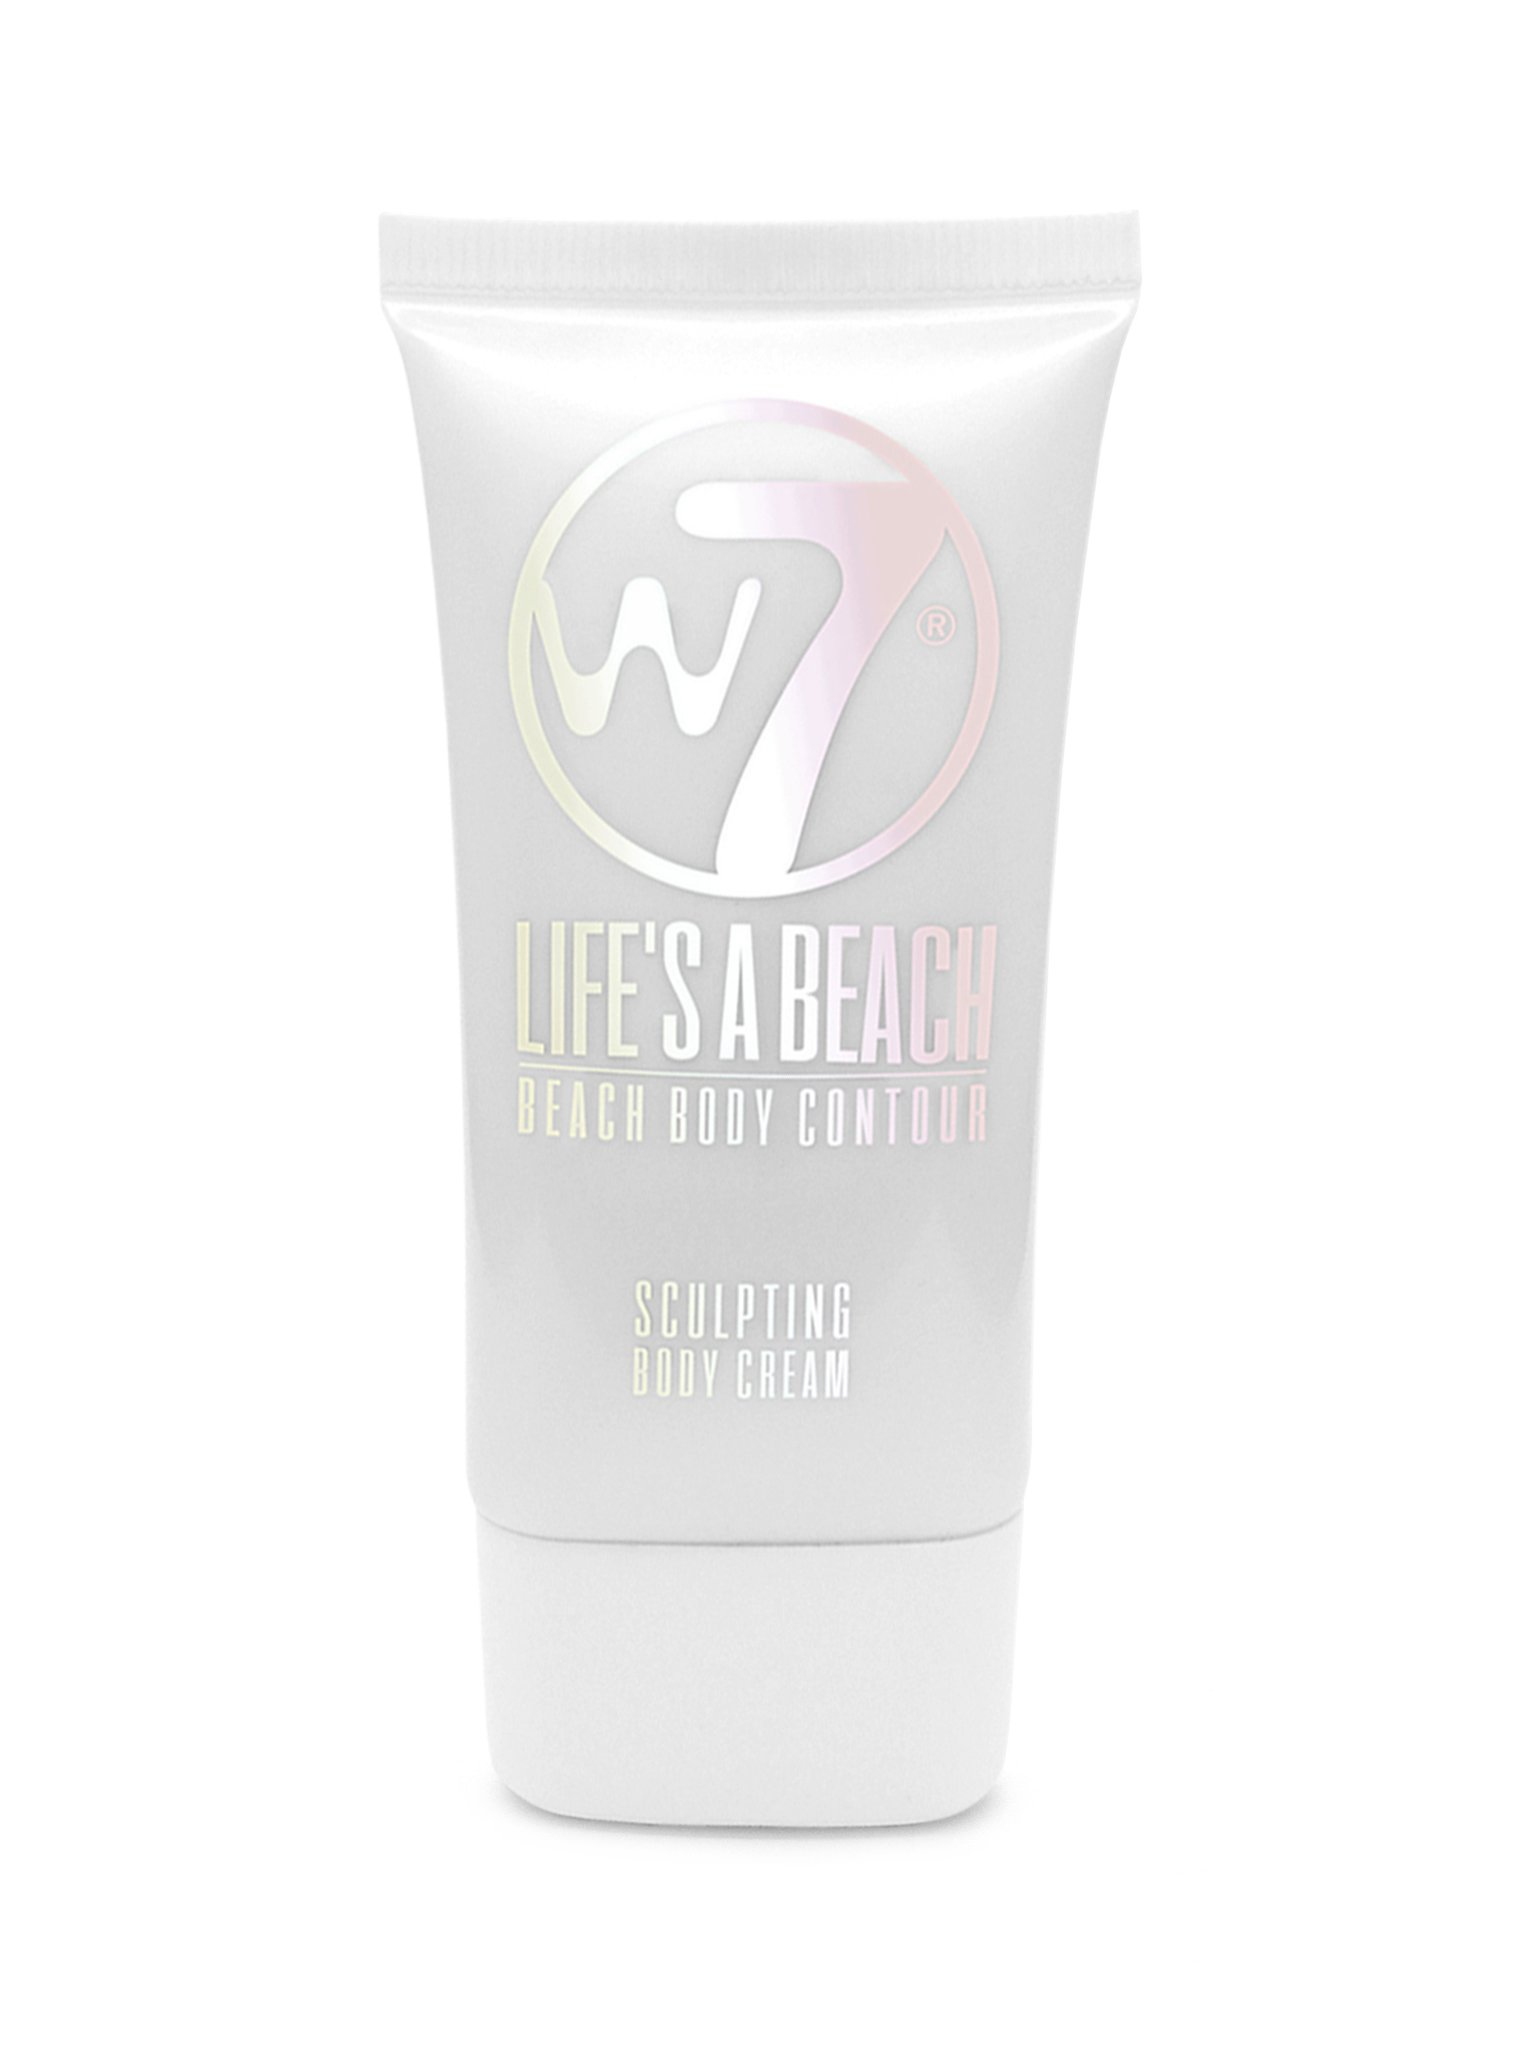 W7 Life's a Beach Body Sculpting Cream - Beach Babe Bronze